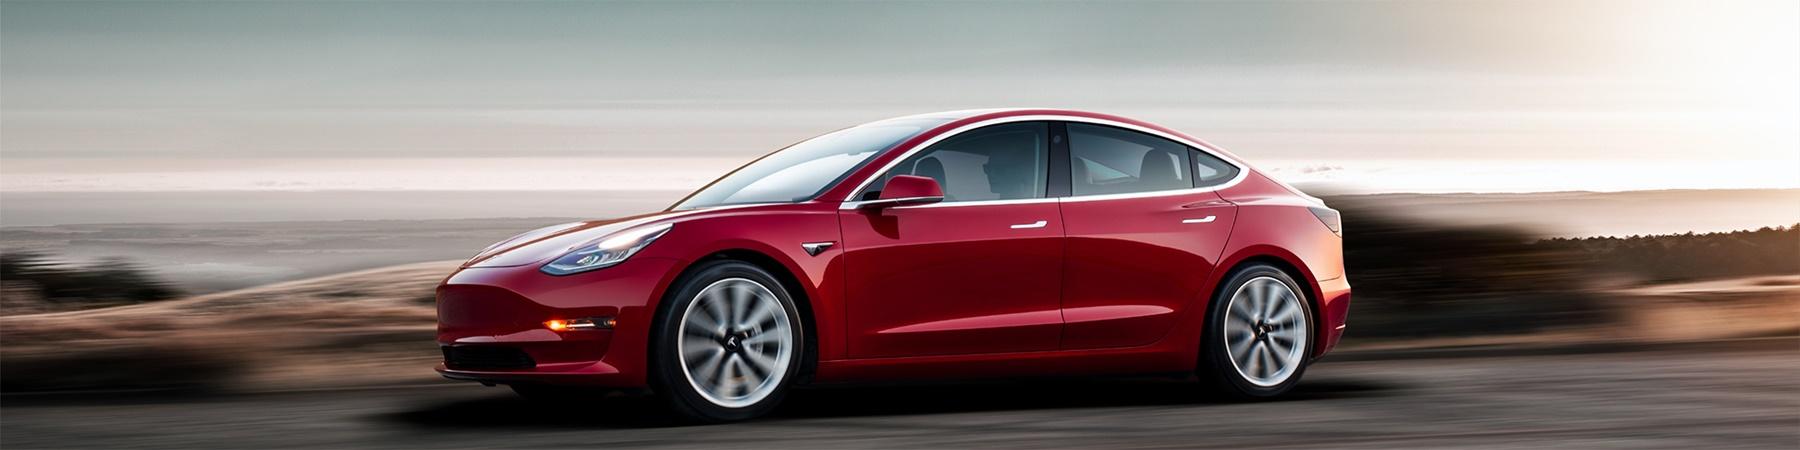 Tesla Model 3 75kWh 451 km actieradius